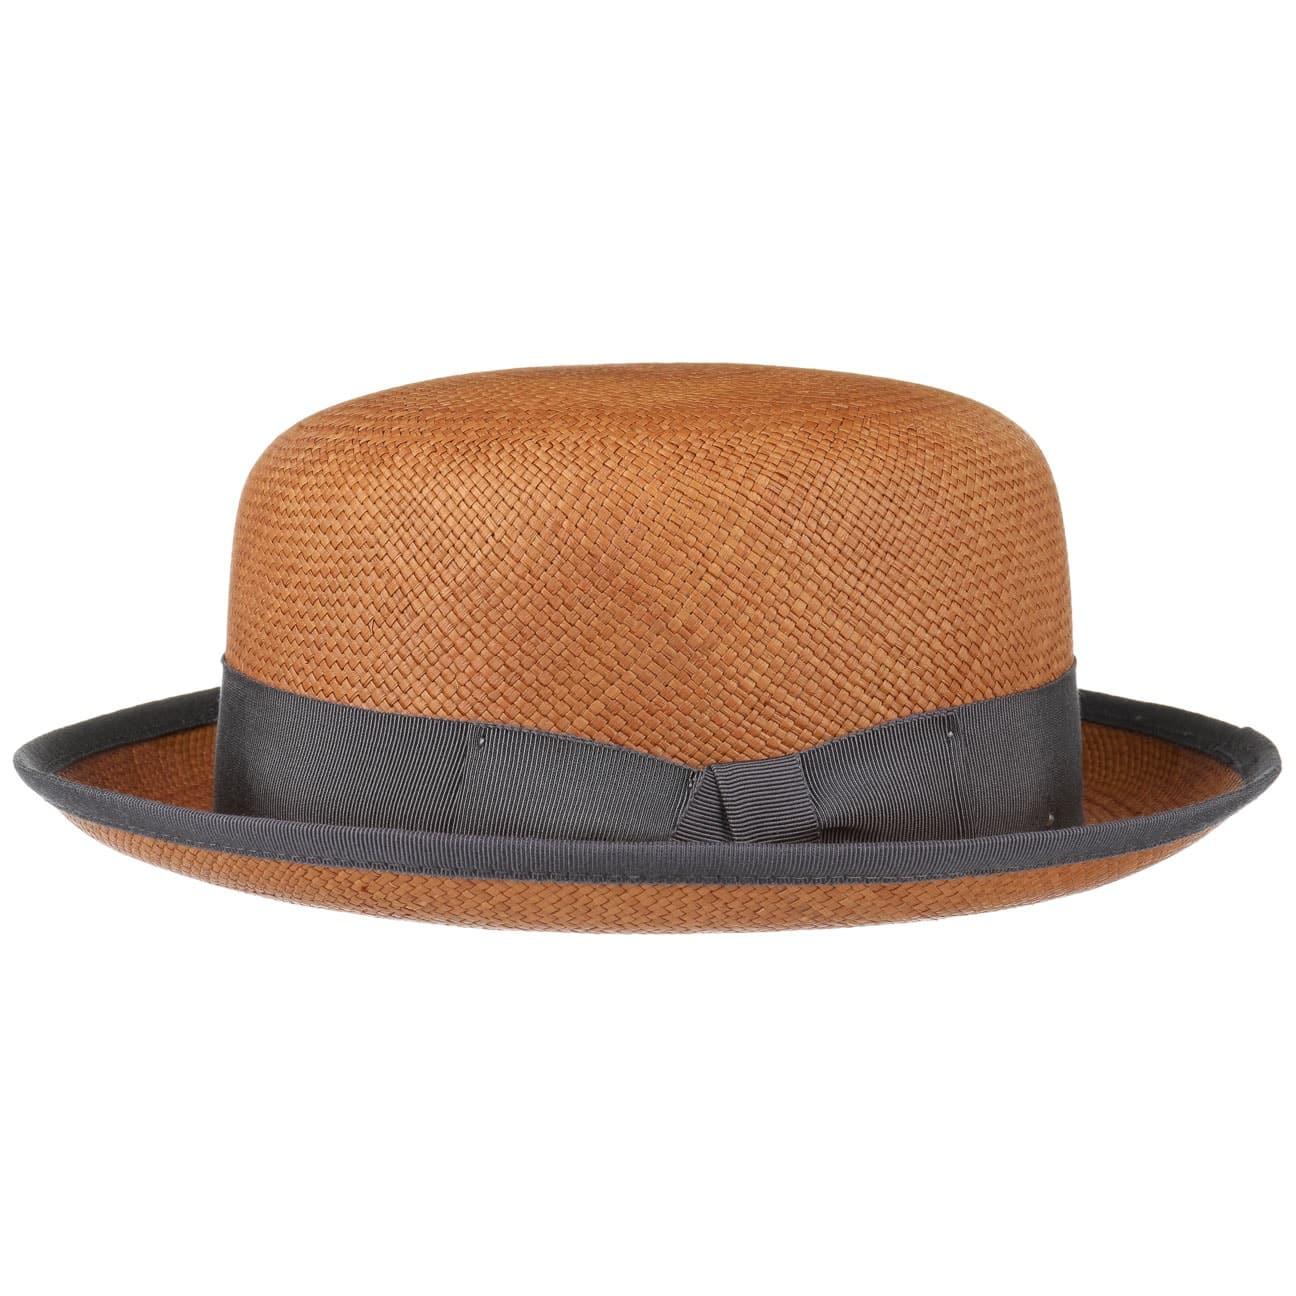 Sombrero Chaplin by Bailey of Hollywood  sombrero